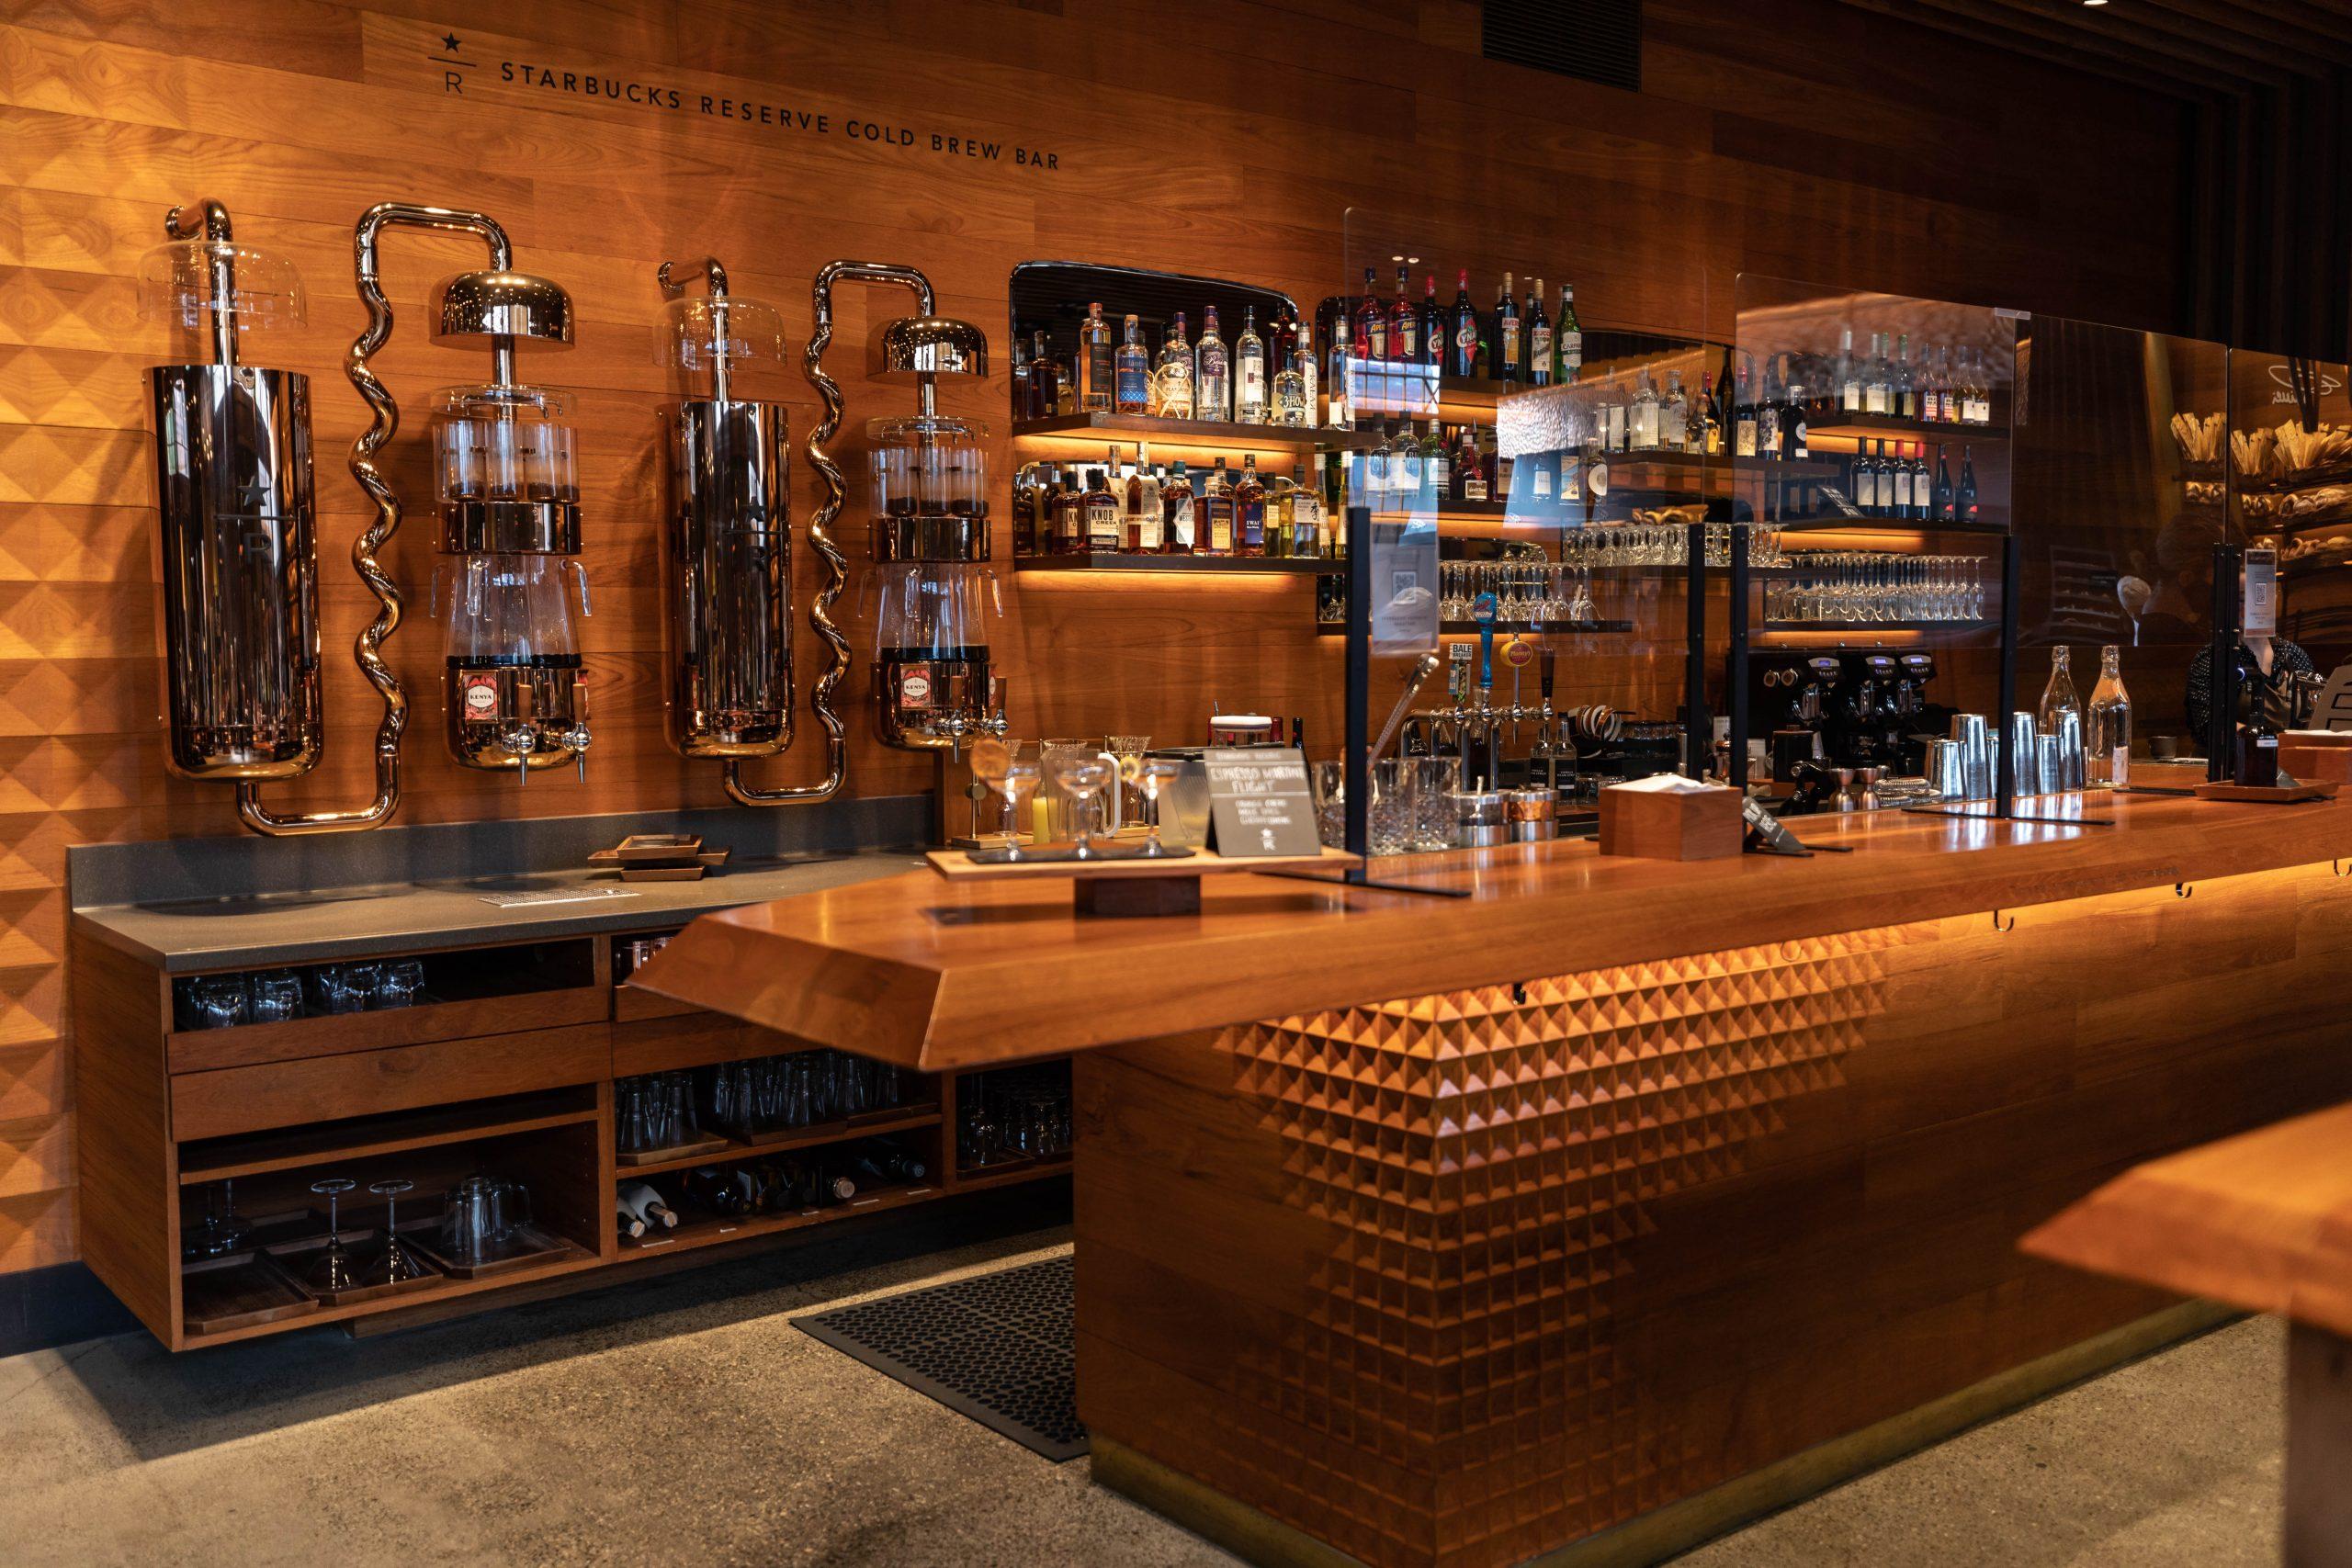 Starbucks Reserve Roastery in Seattle Washington by Annie Fairfax